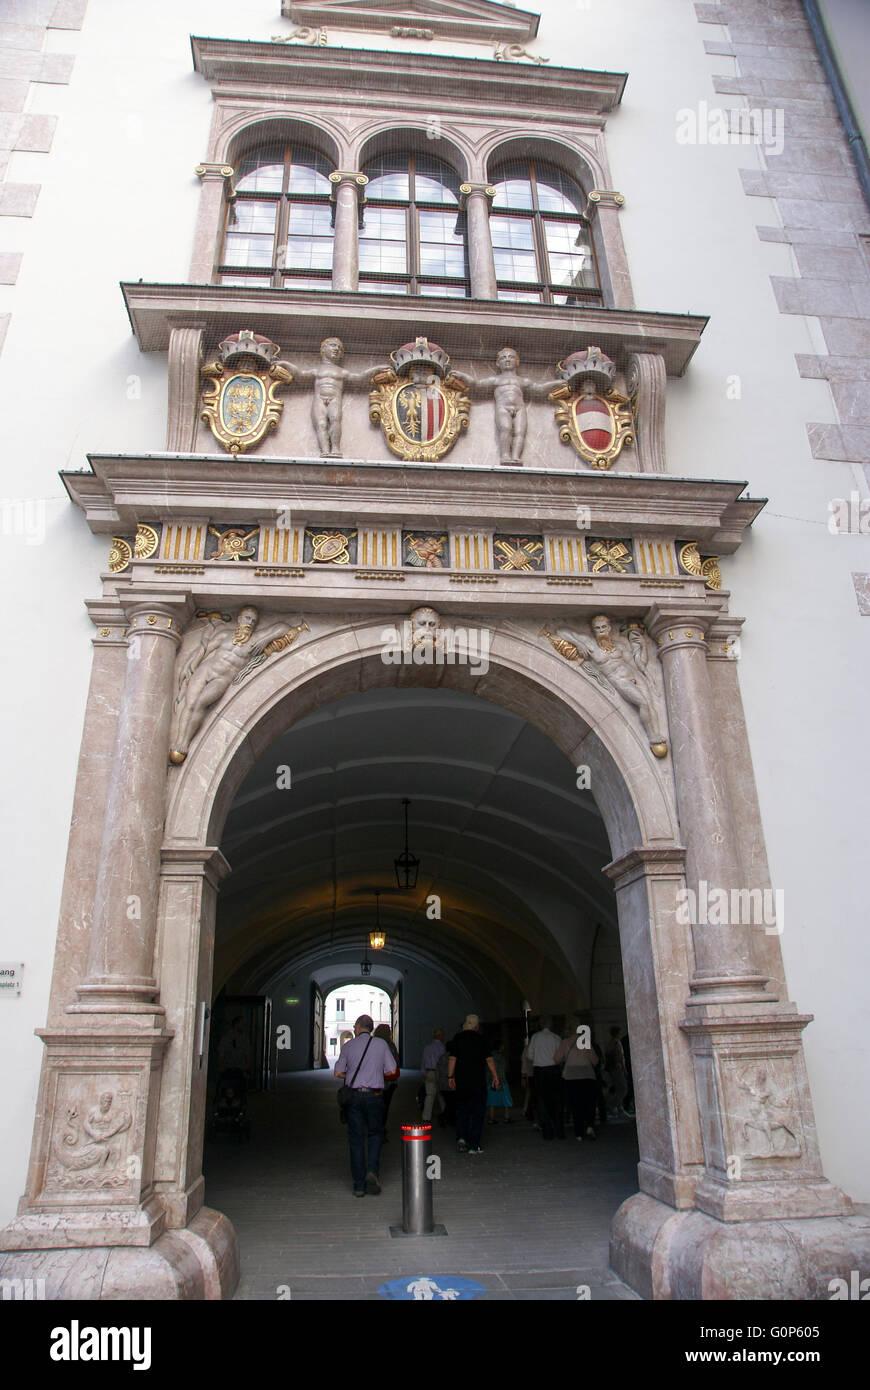 Landhaus archway, Linz, Austria, Old town - Stock Image